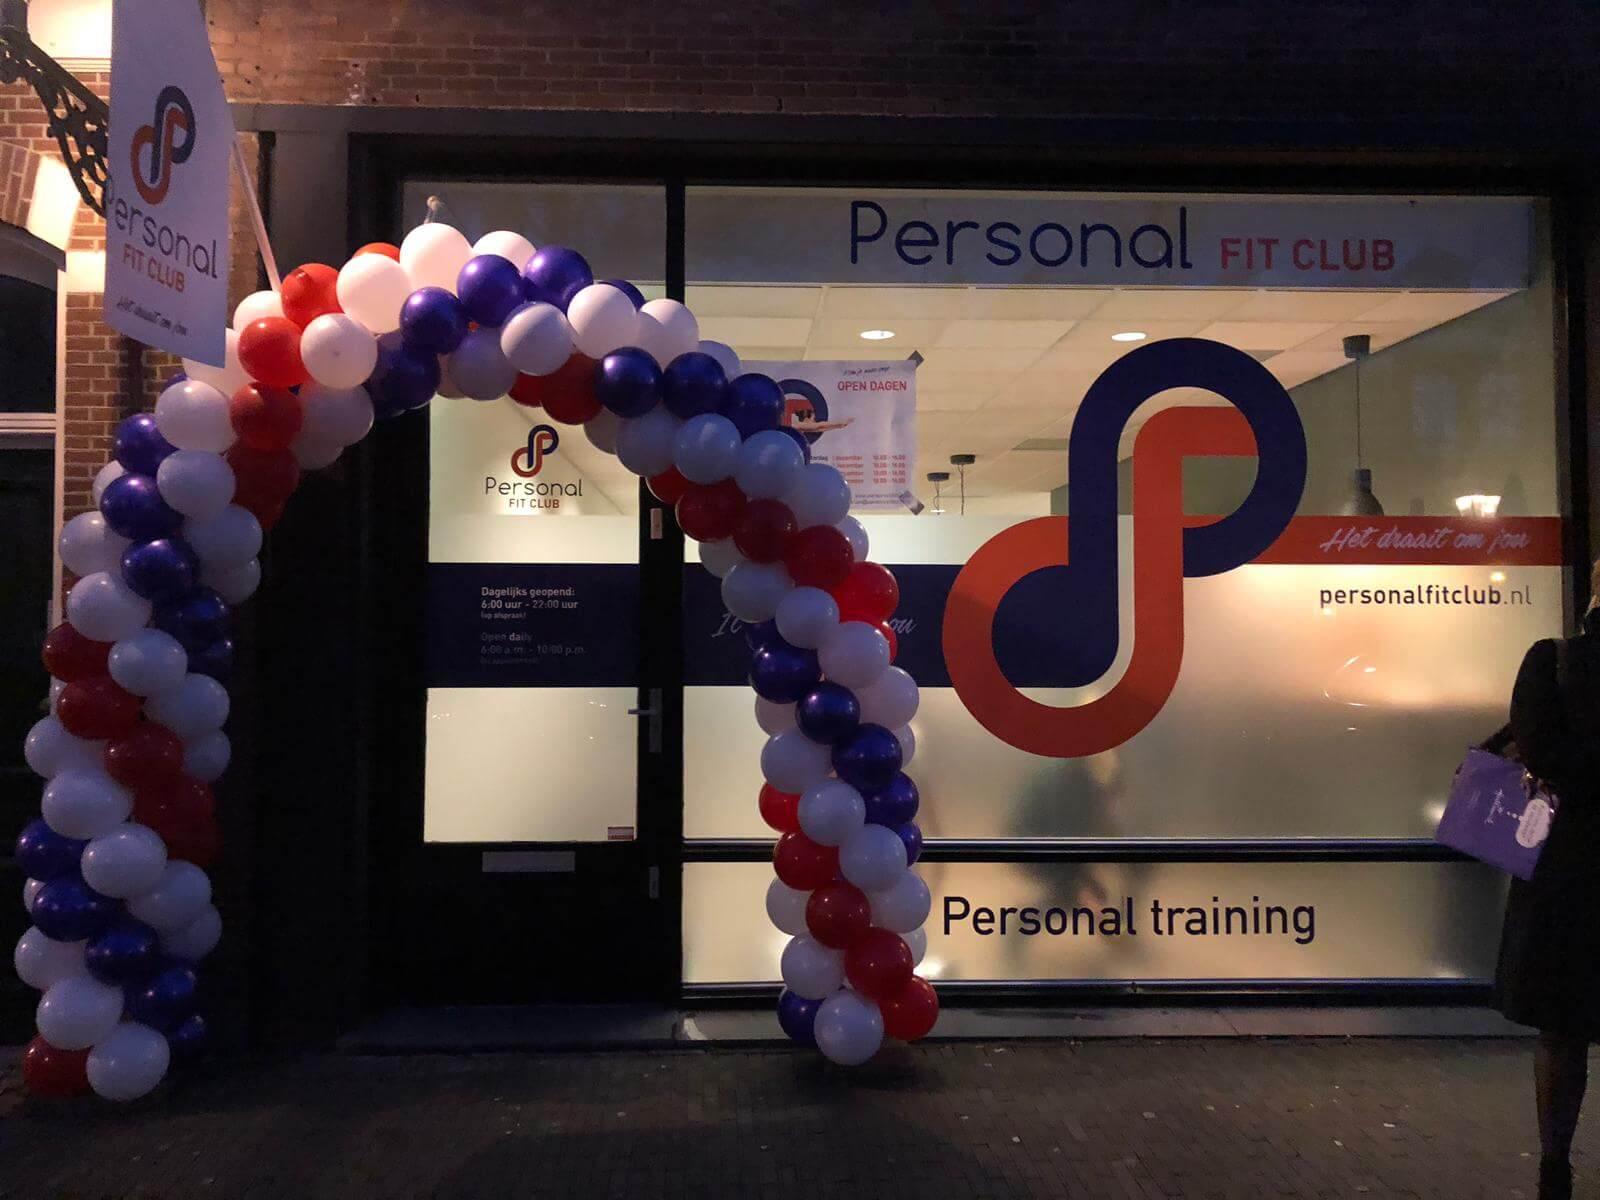 Personal Fit Club - De eerste club voor personal training in Zoetermeer is open (1)